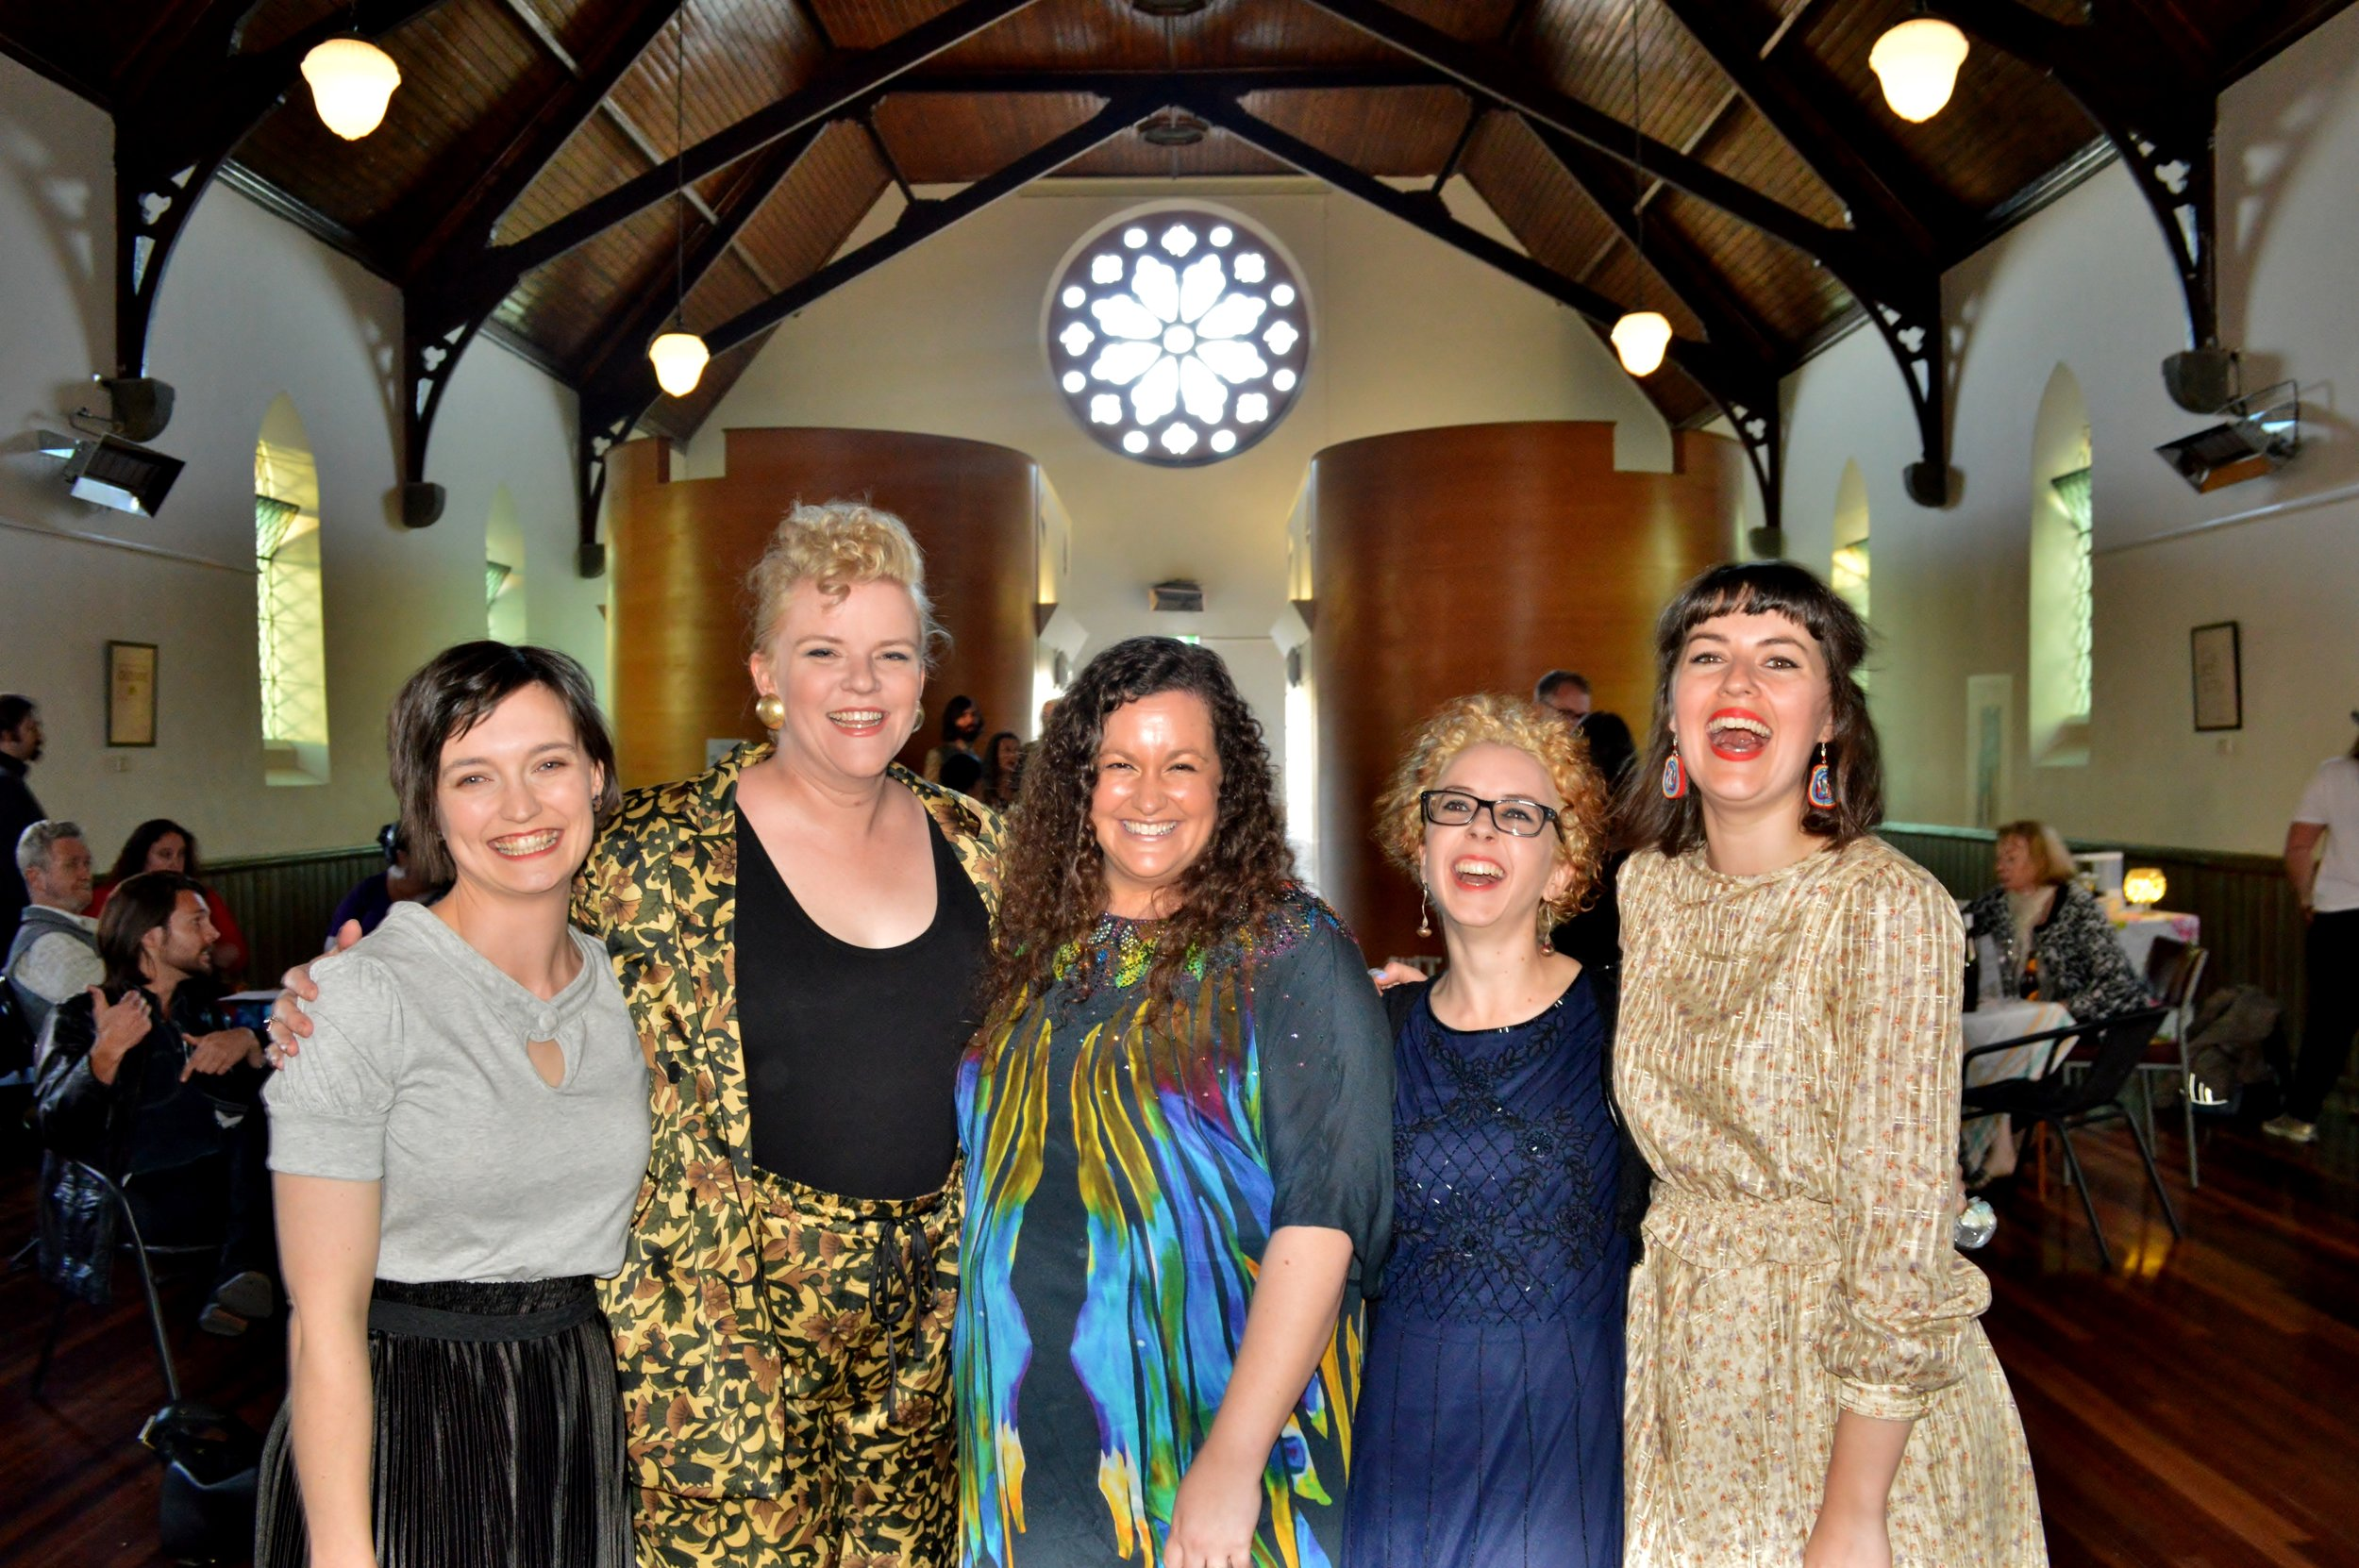 wit incorporated (L-R): Belinda Campbell, Jennifer Piper, Claire Bowen, Allison Bell, Sarah Clarke